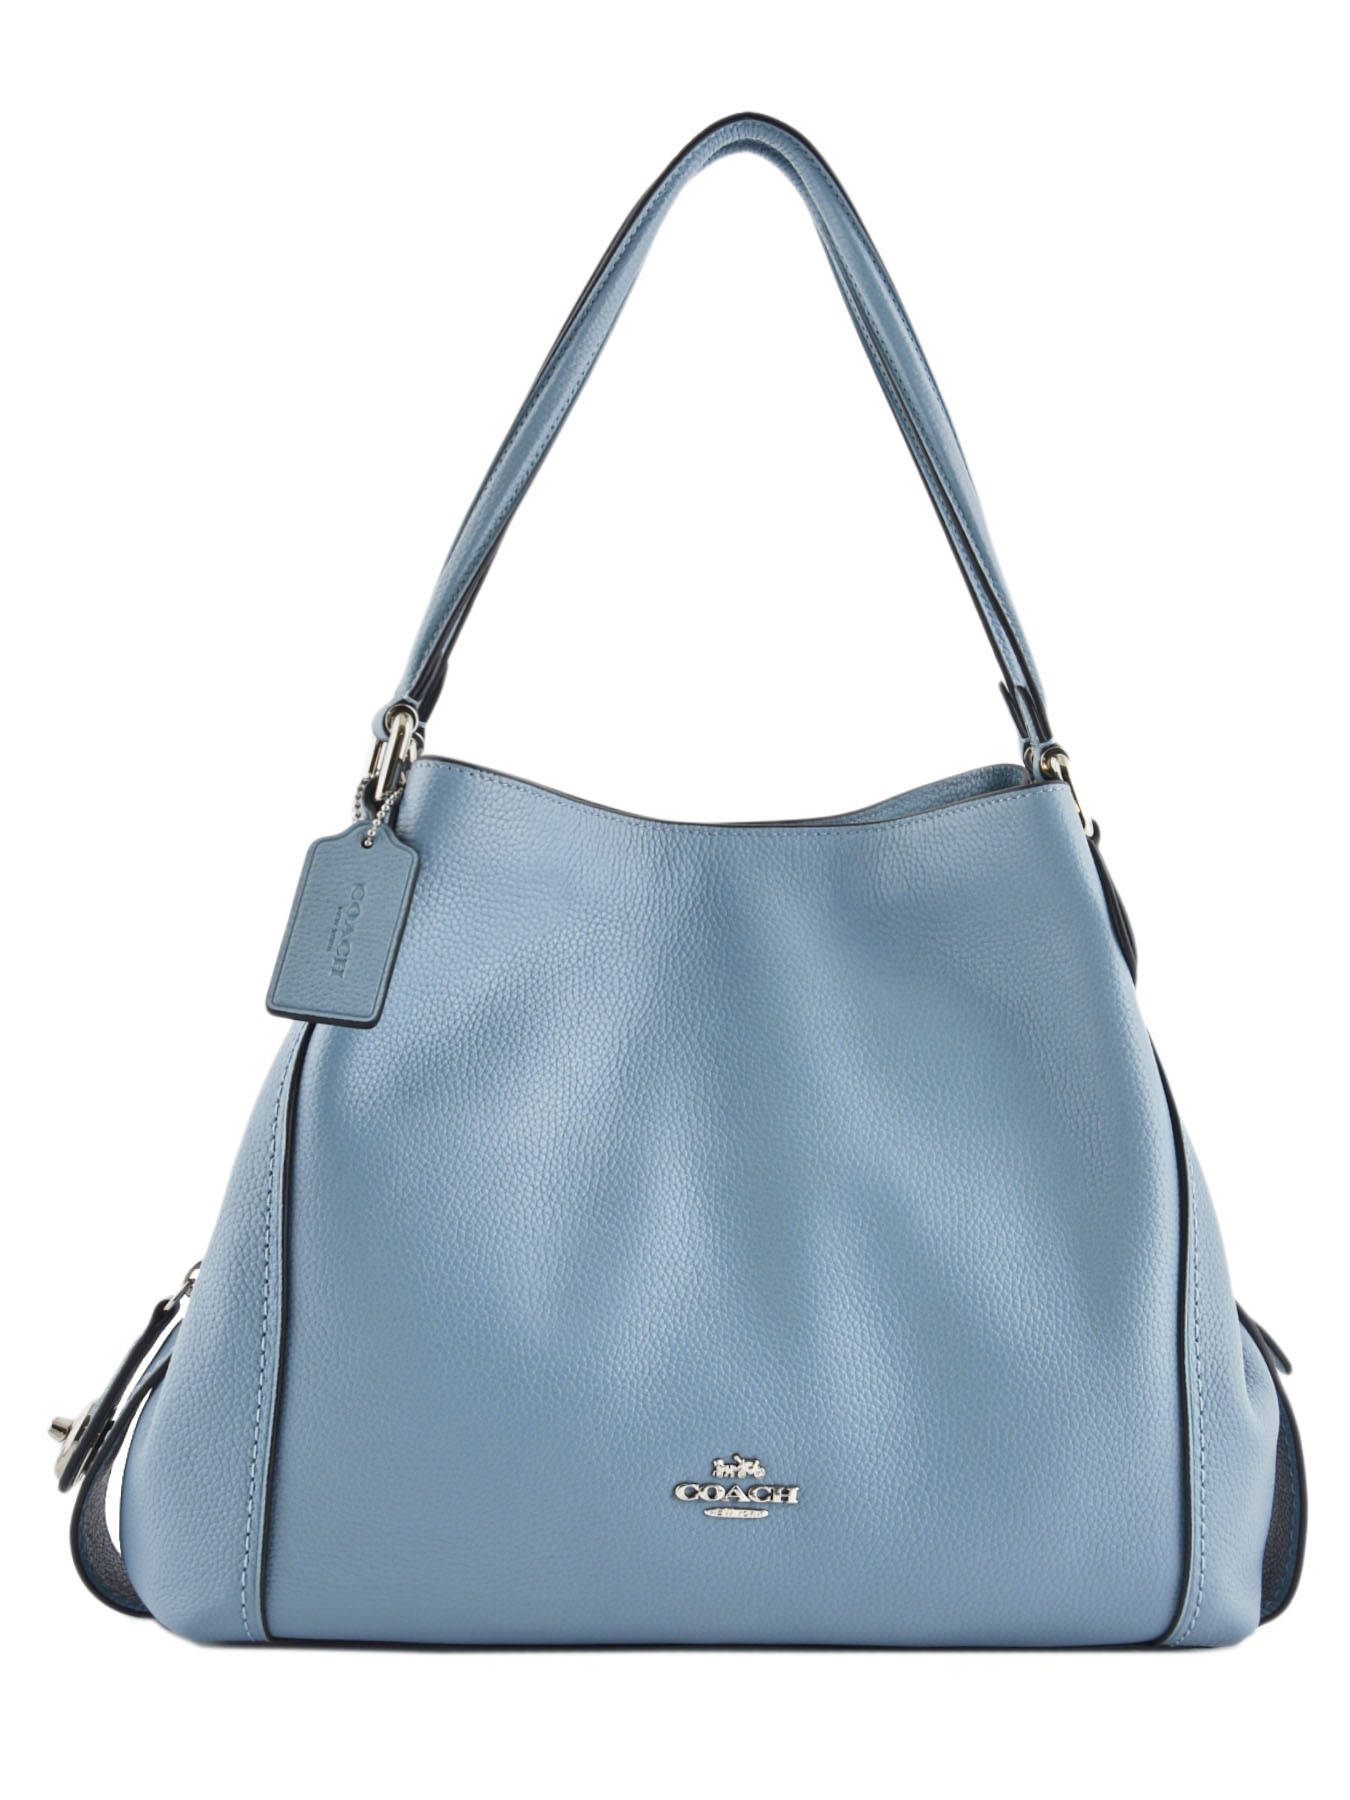 ... Shoulder Bag Coach Blue edie 57125 ... 76aa4a9dfb67f